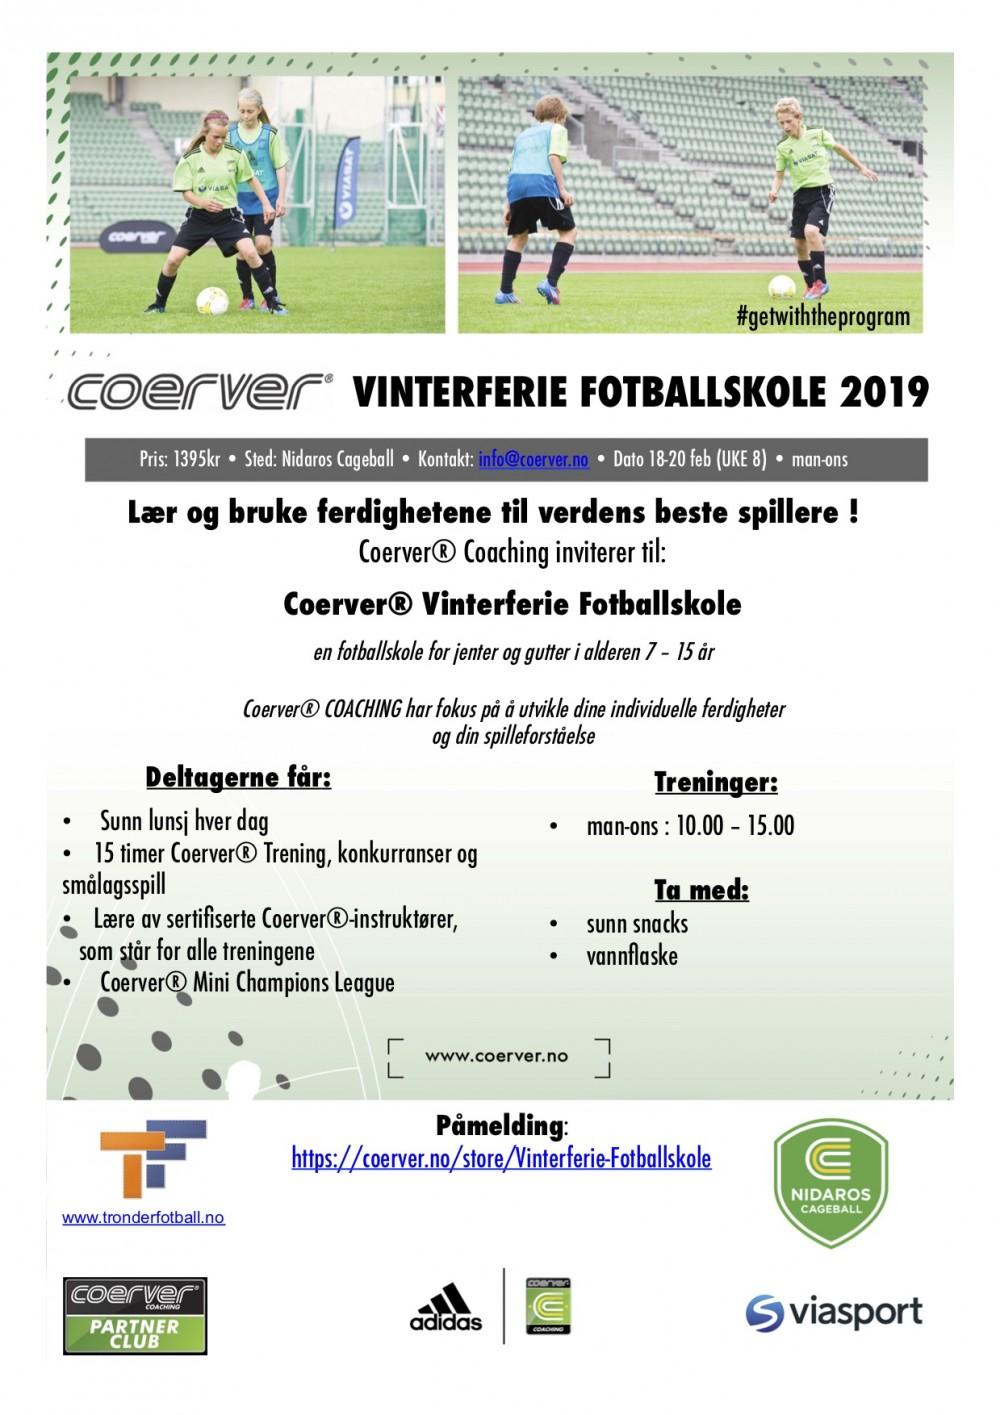 Vinterferie Fotballskole i Trondheim